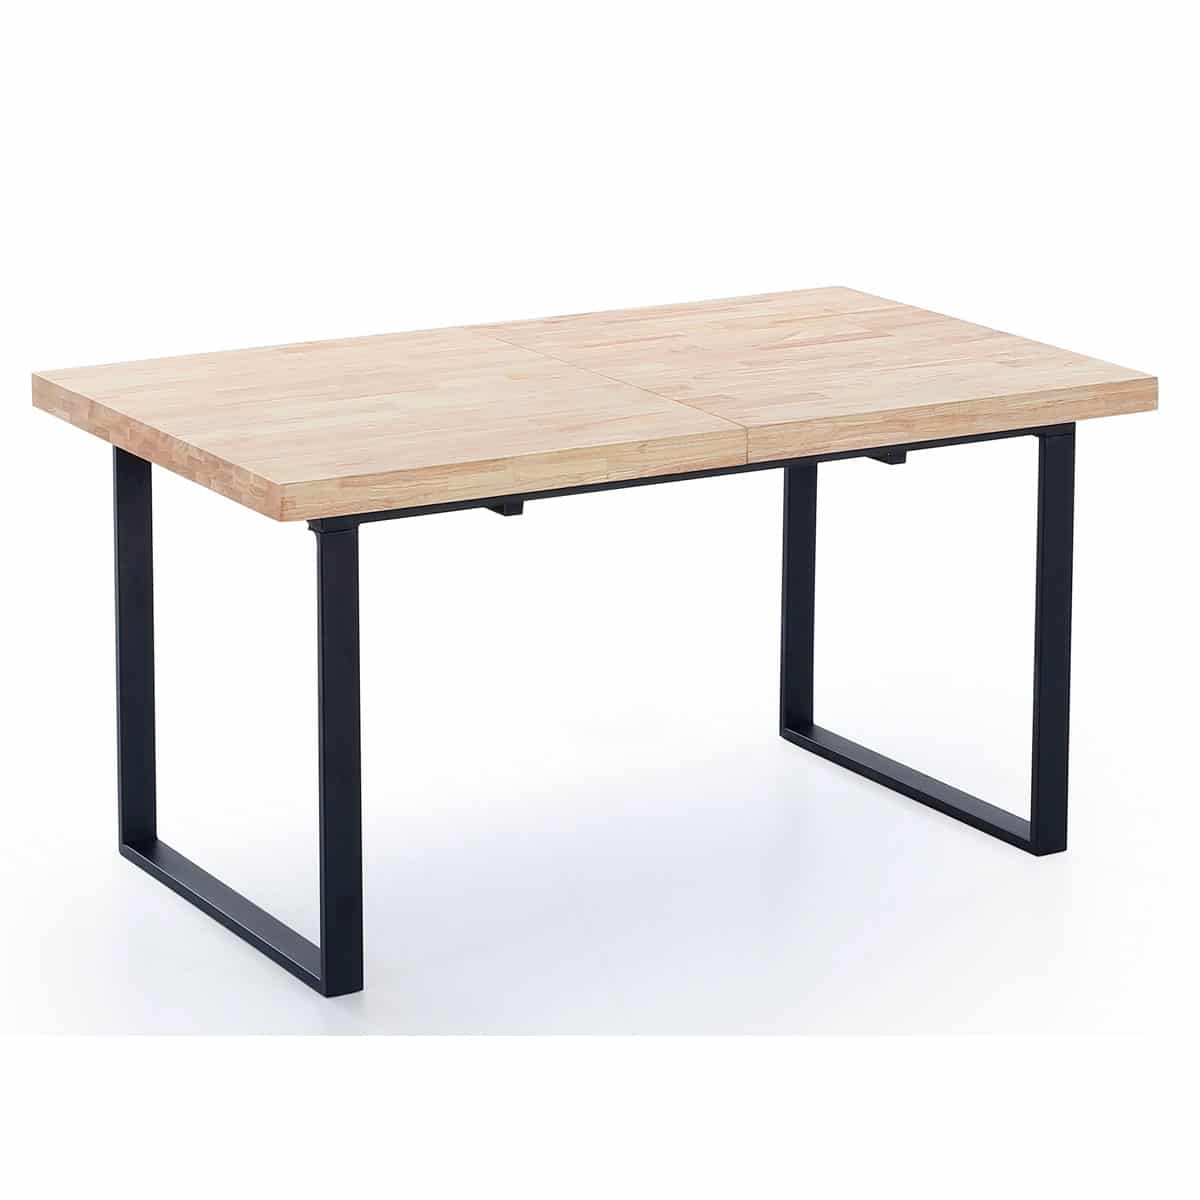 Mesa extensible roble acero - Artikalia - Muebles de diseño